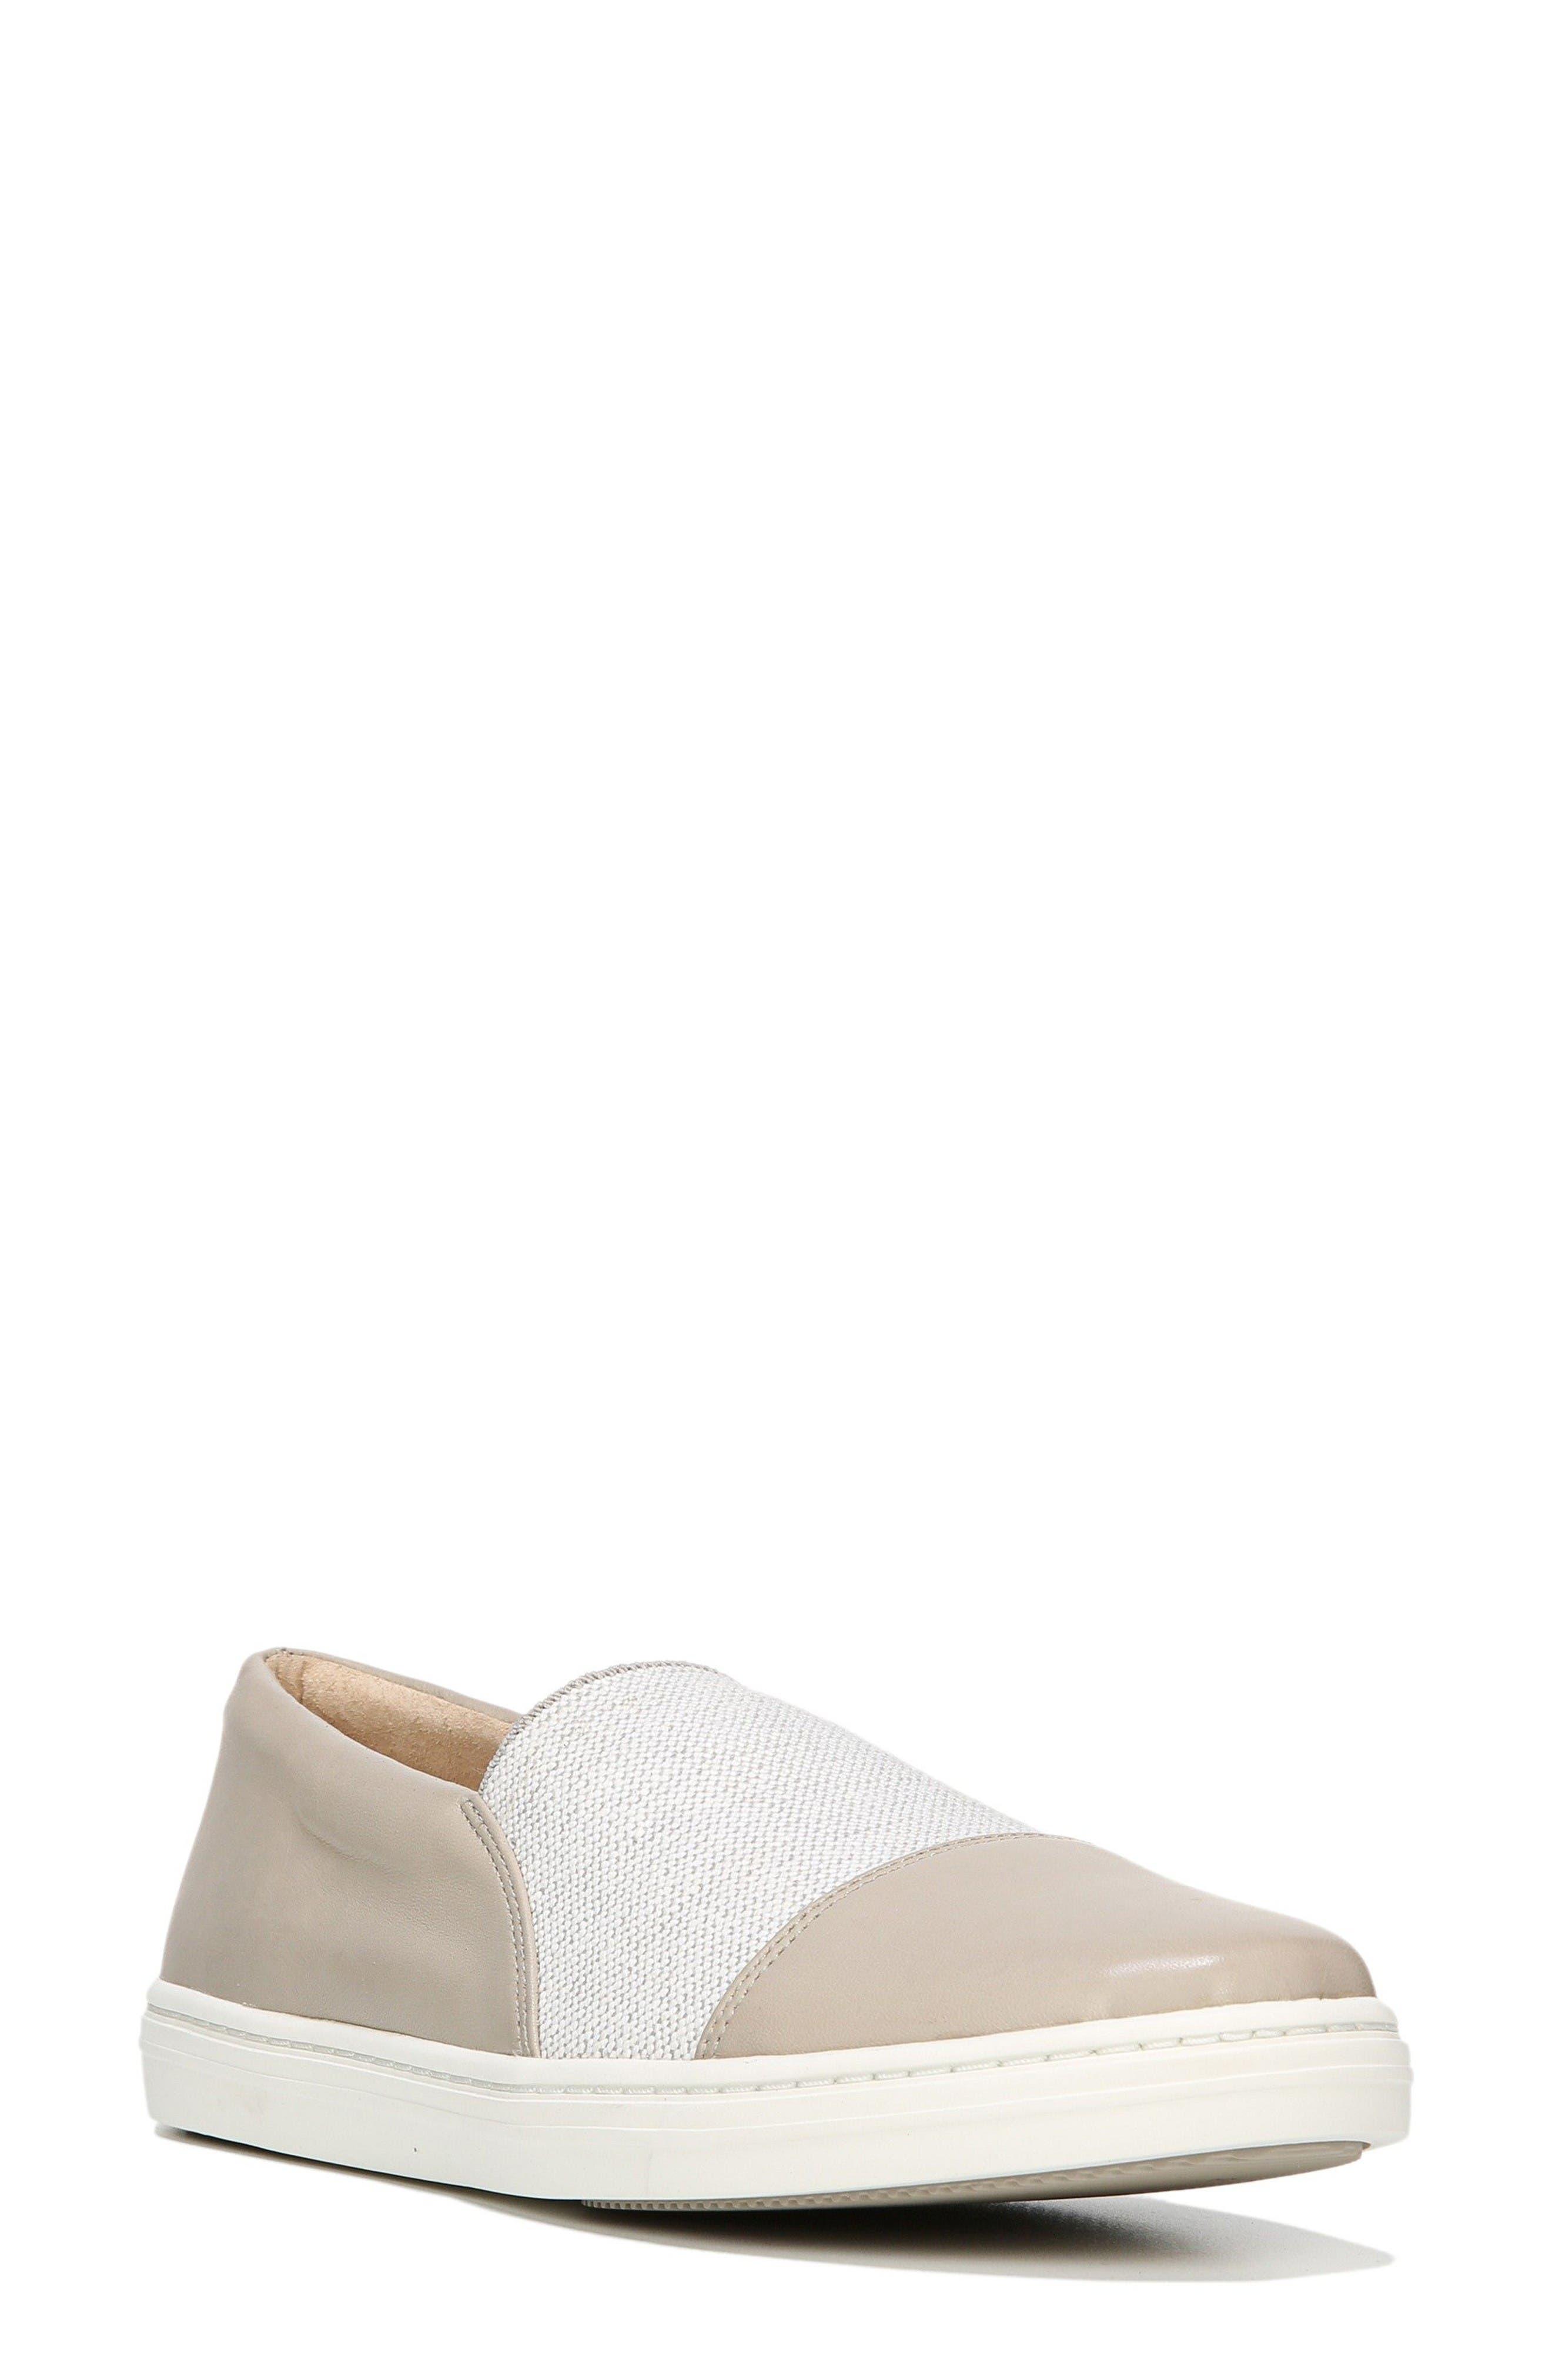 Raine Slip-On Sneaker,                             Main thumbnail 1, color,                             Pavillion Grey Leather